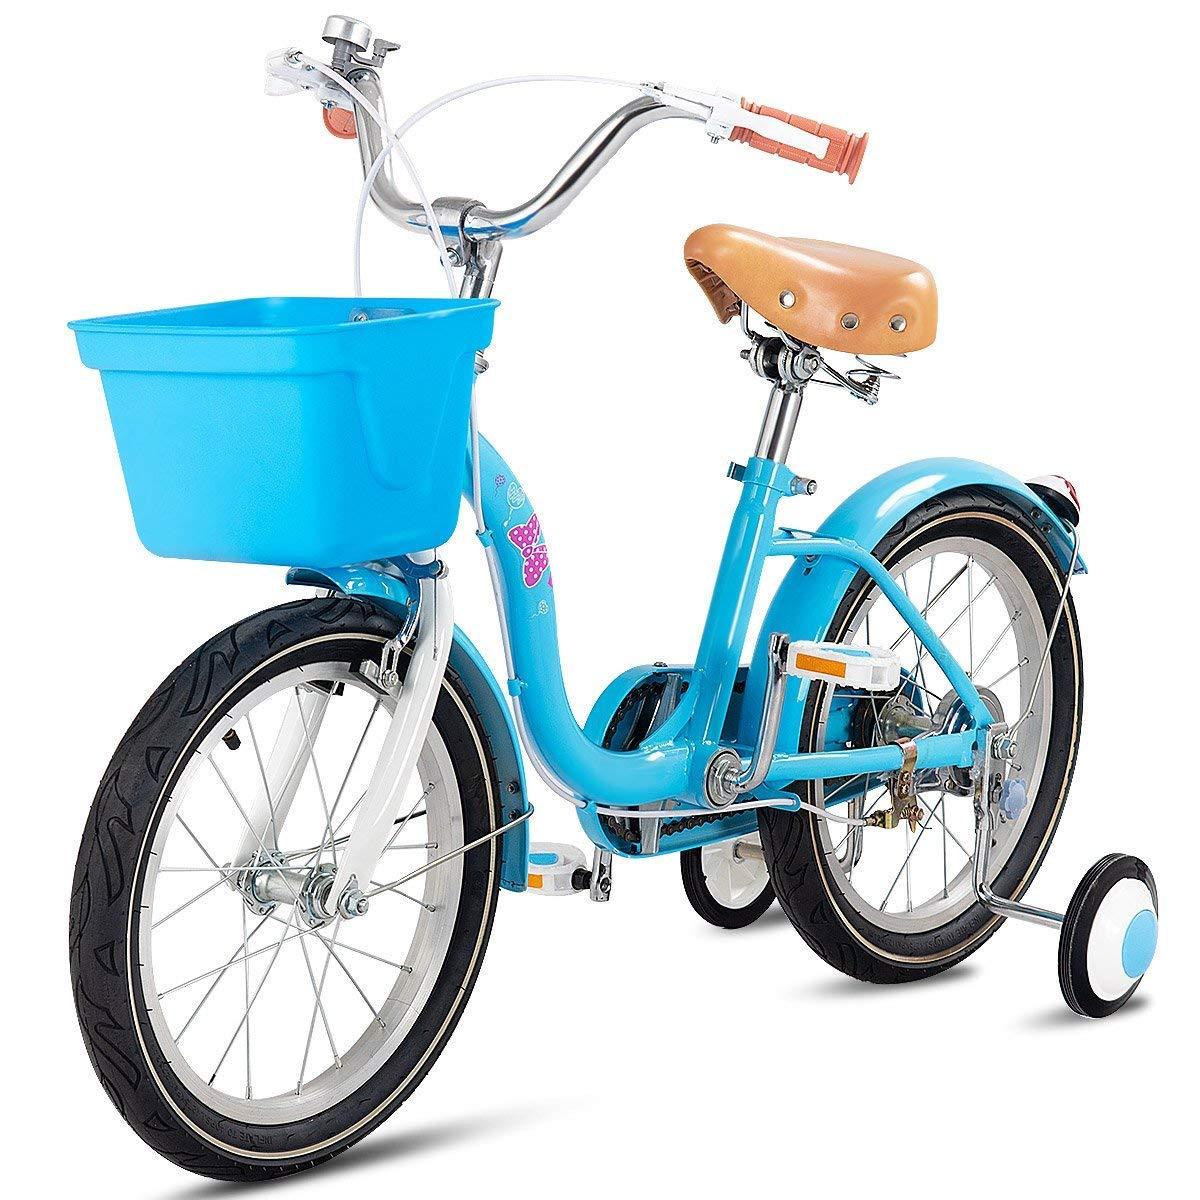 Goplus Kid' s Bike Freestyle Outdoor Sports Bicycle Training Wheels, Basket, Hand Brake Rear Break Boy's Girl's Bike Kids Hand Brake and Rear Break Boy' s and Girl' s Bike for Kids (Blue 12) Superbuy